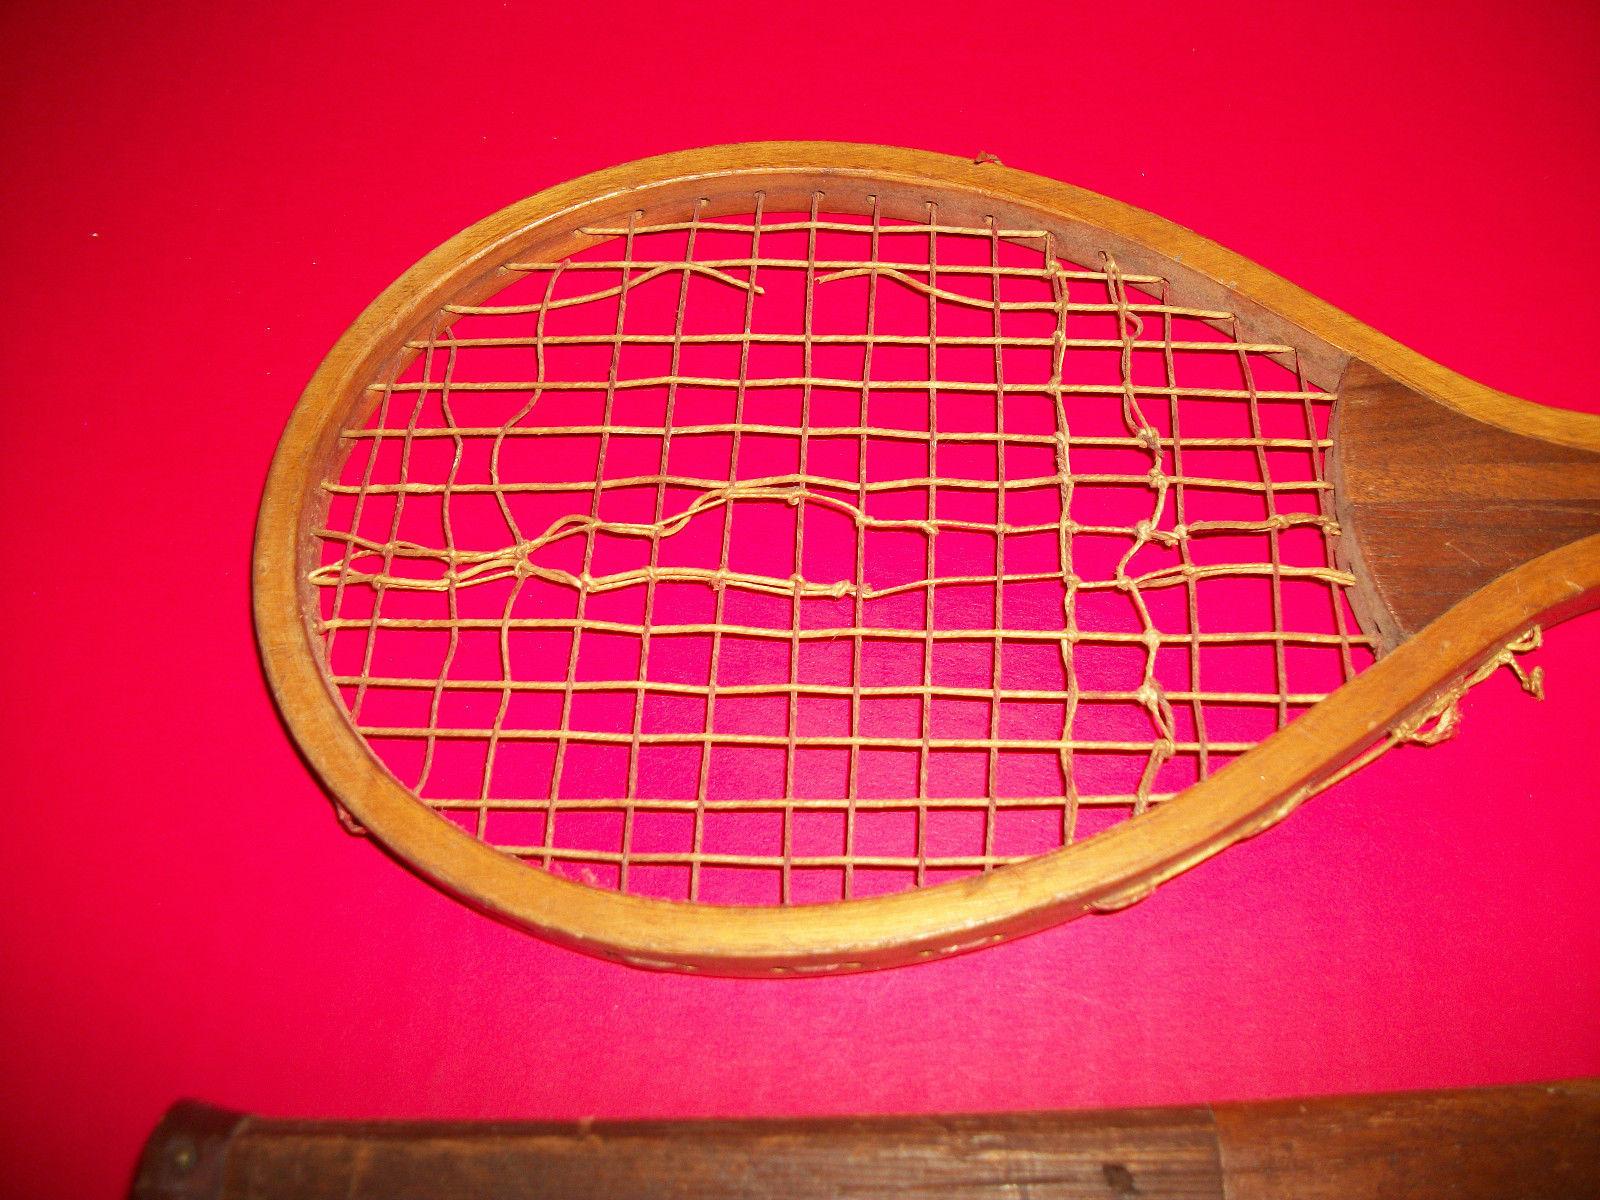 Sport Treasure Tennis Racquet Racket Sporting Good Pair Old Wood Equipment Decor image 3